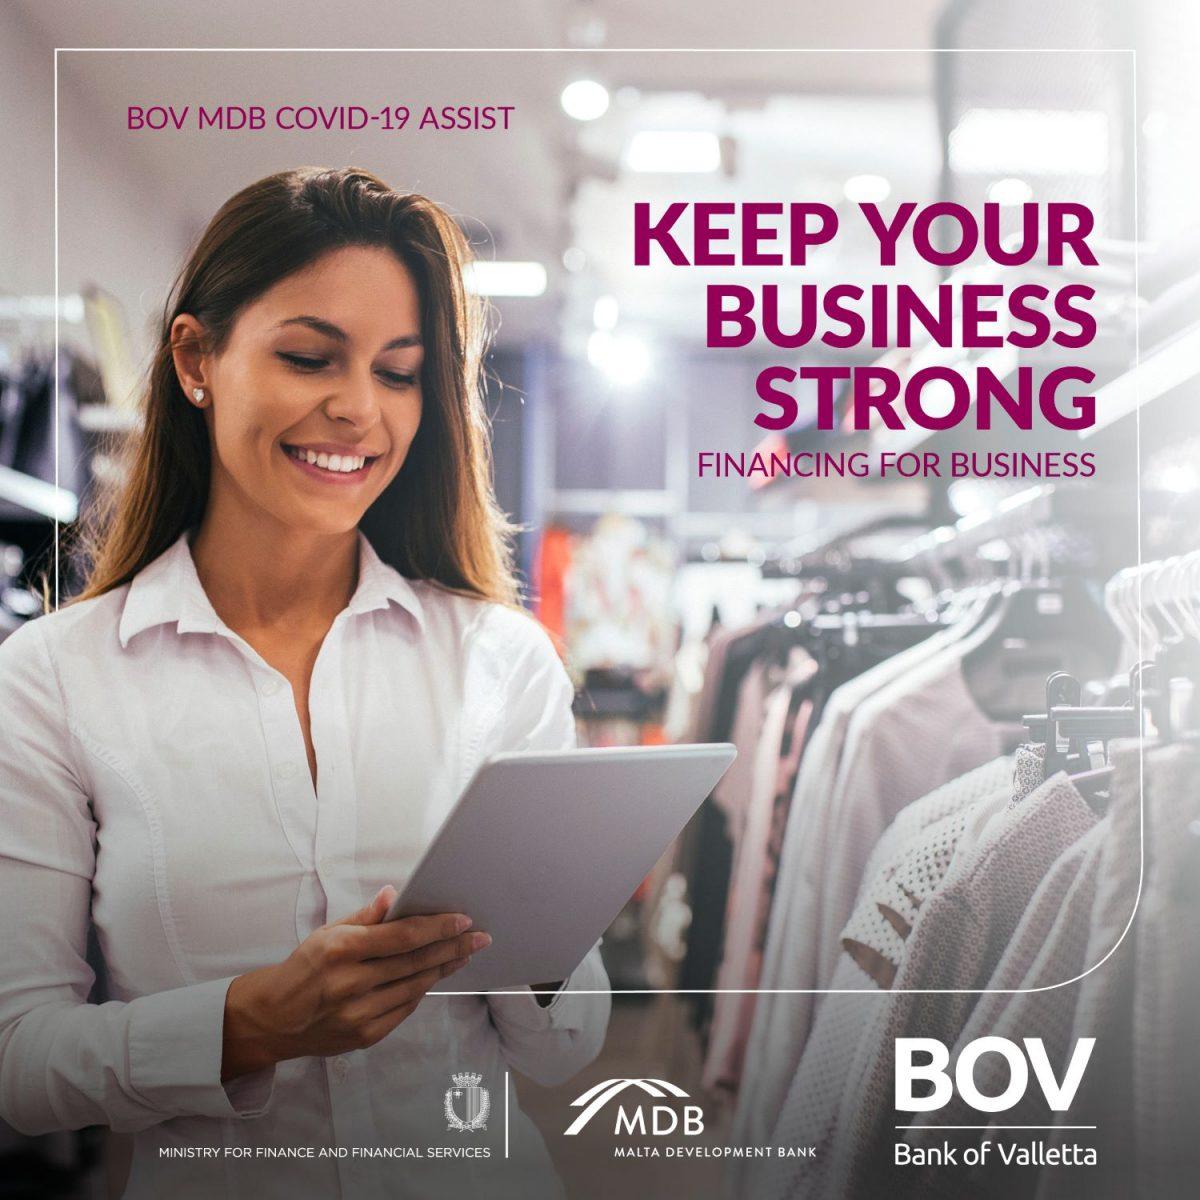 €192 million financing to businesses through the BOV-MDB COVID Assist